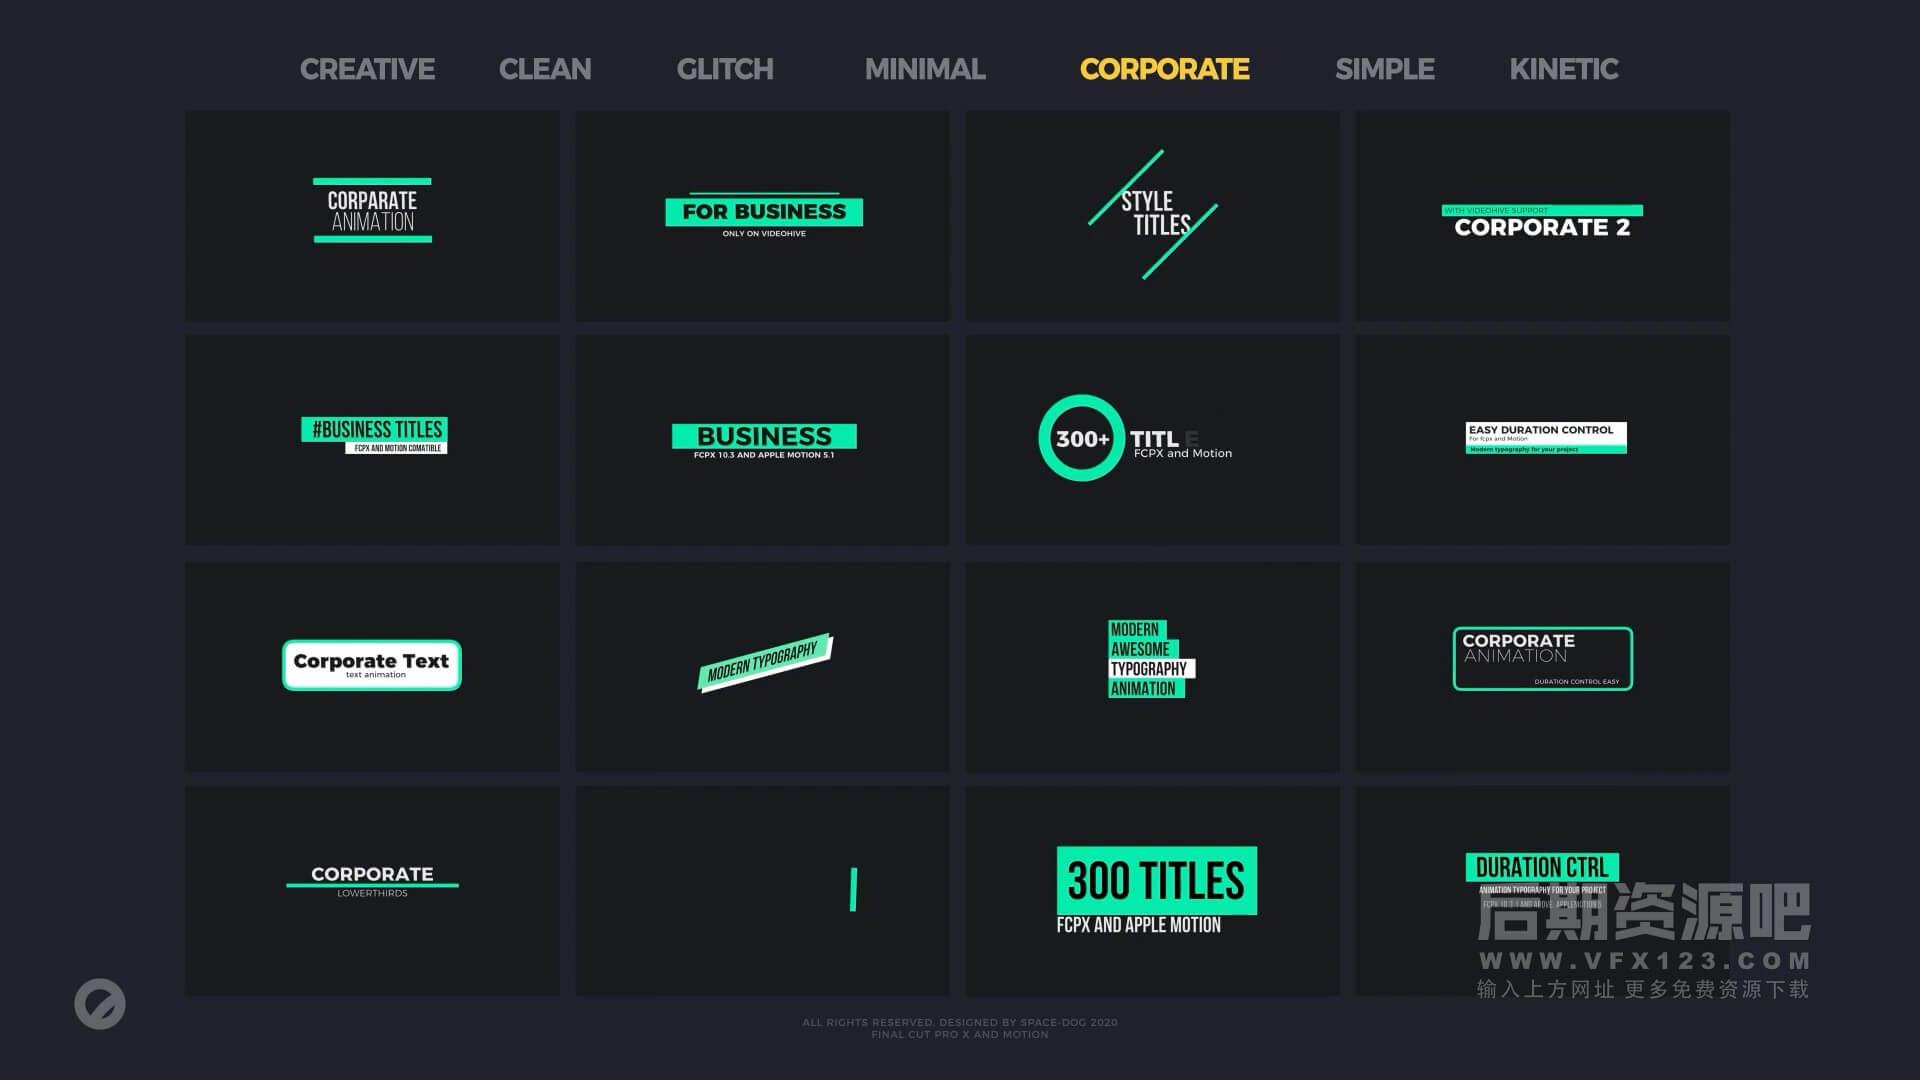 fcpx标题模板 300个现代创意文字标题排版预设 干扰迷你商务简约运动等